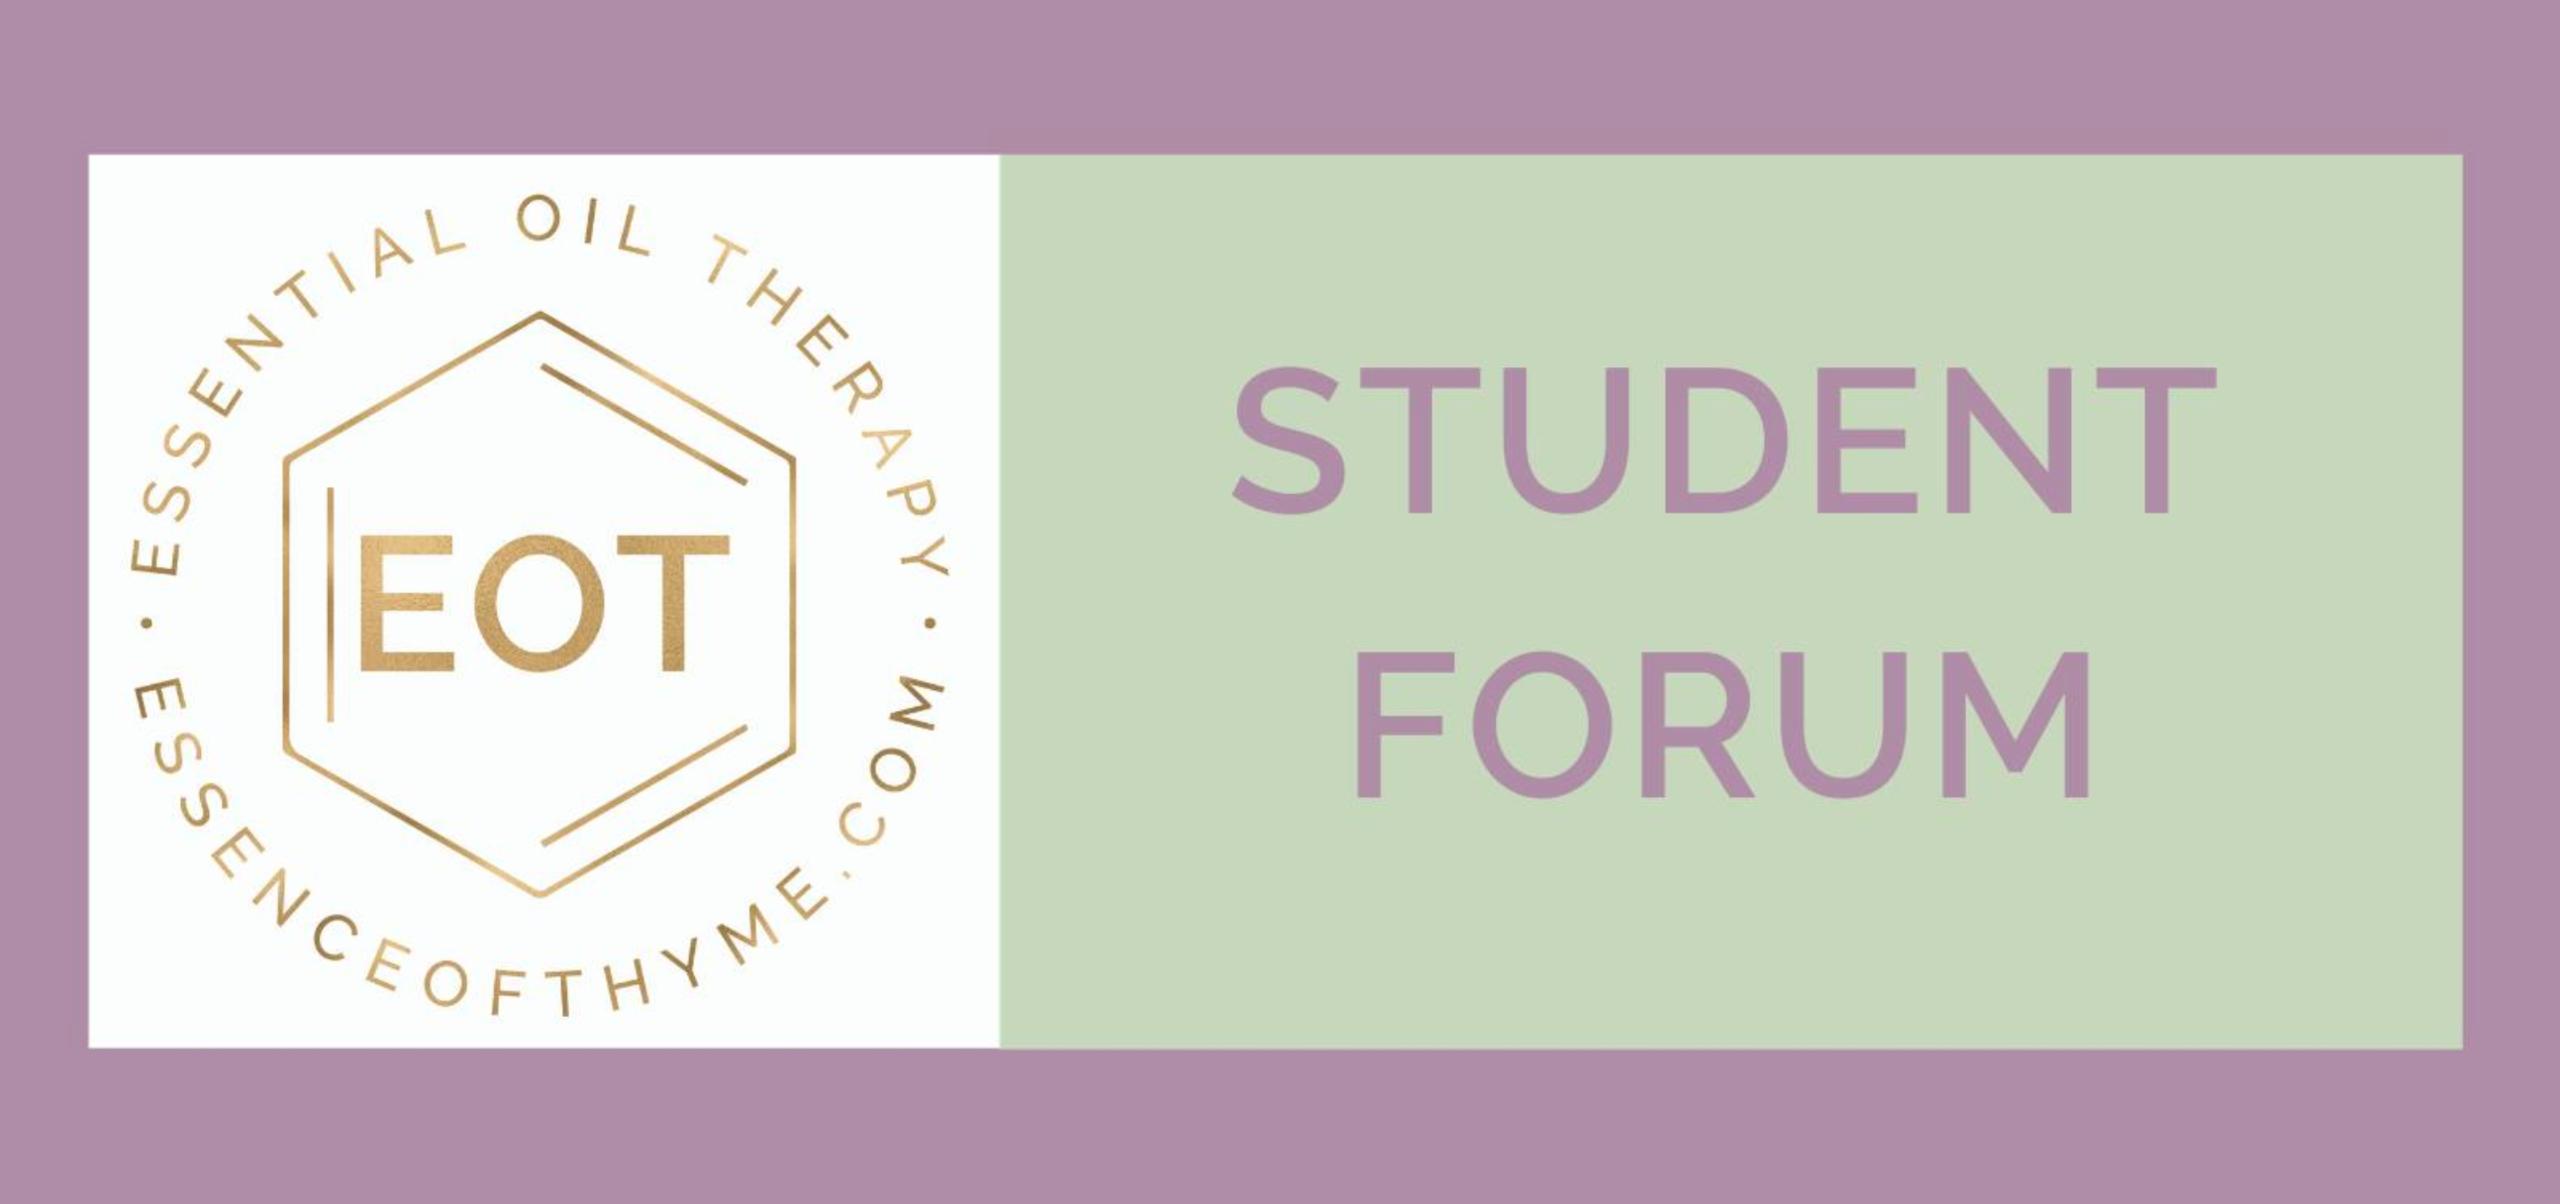 Essence of Thyme College of Holistic Studies Ltd.